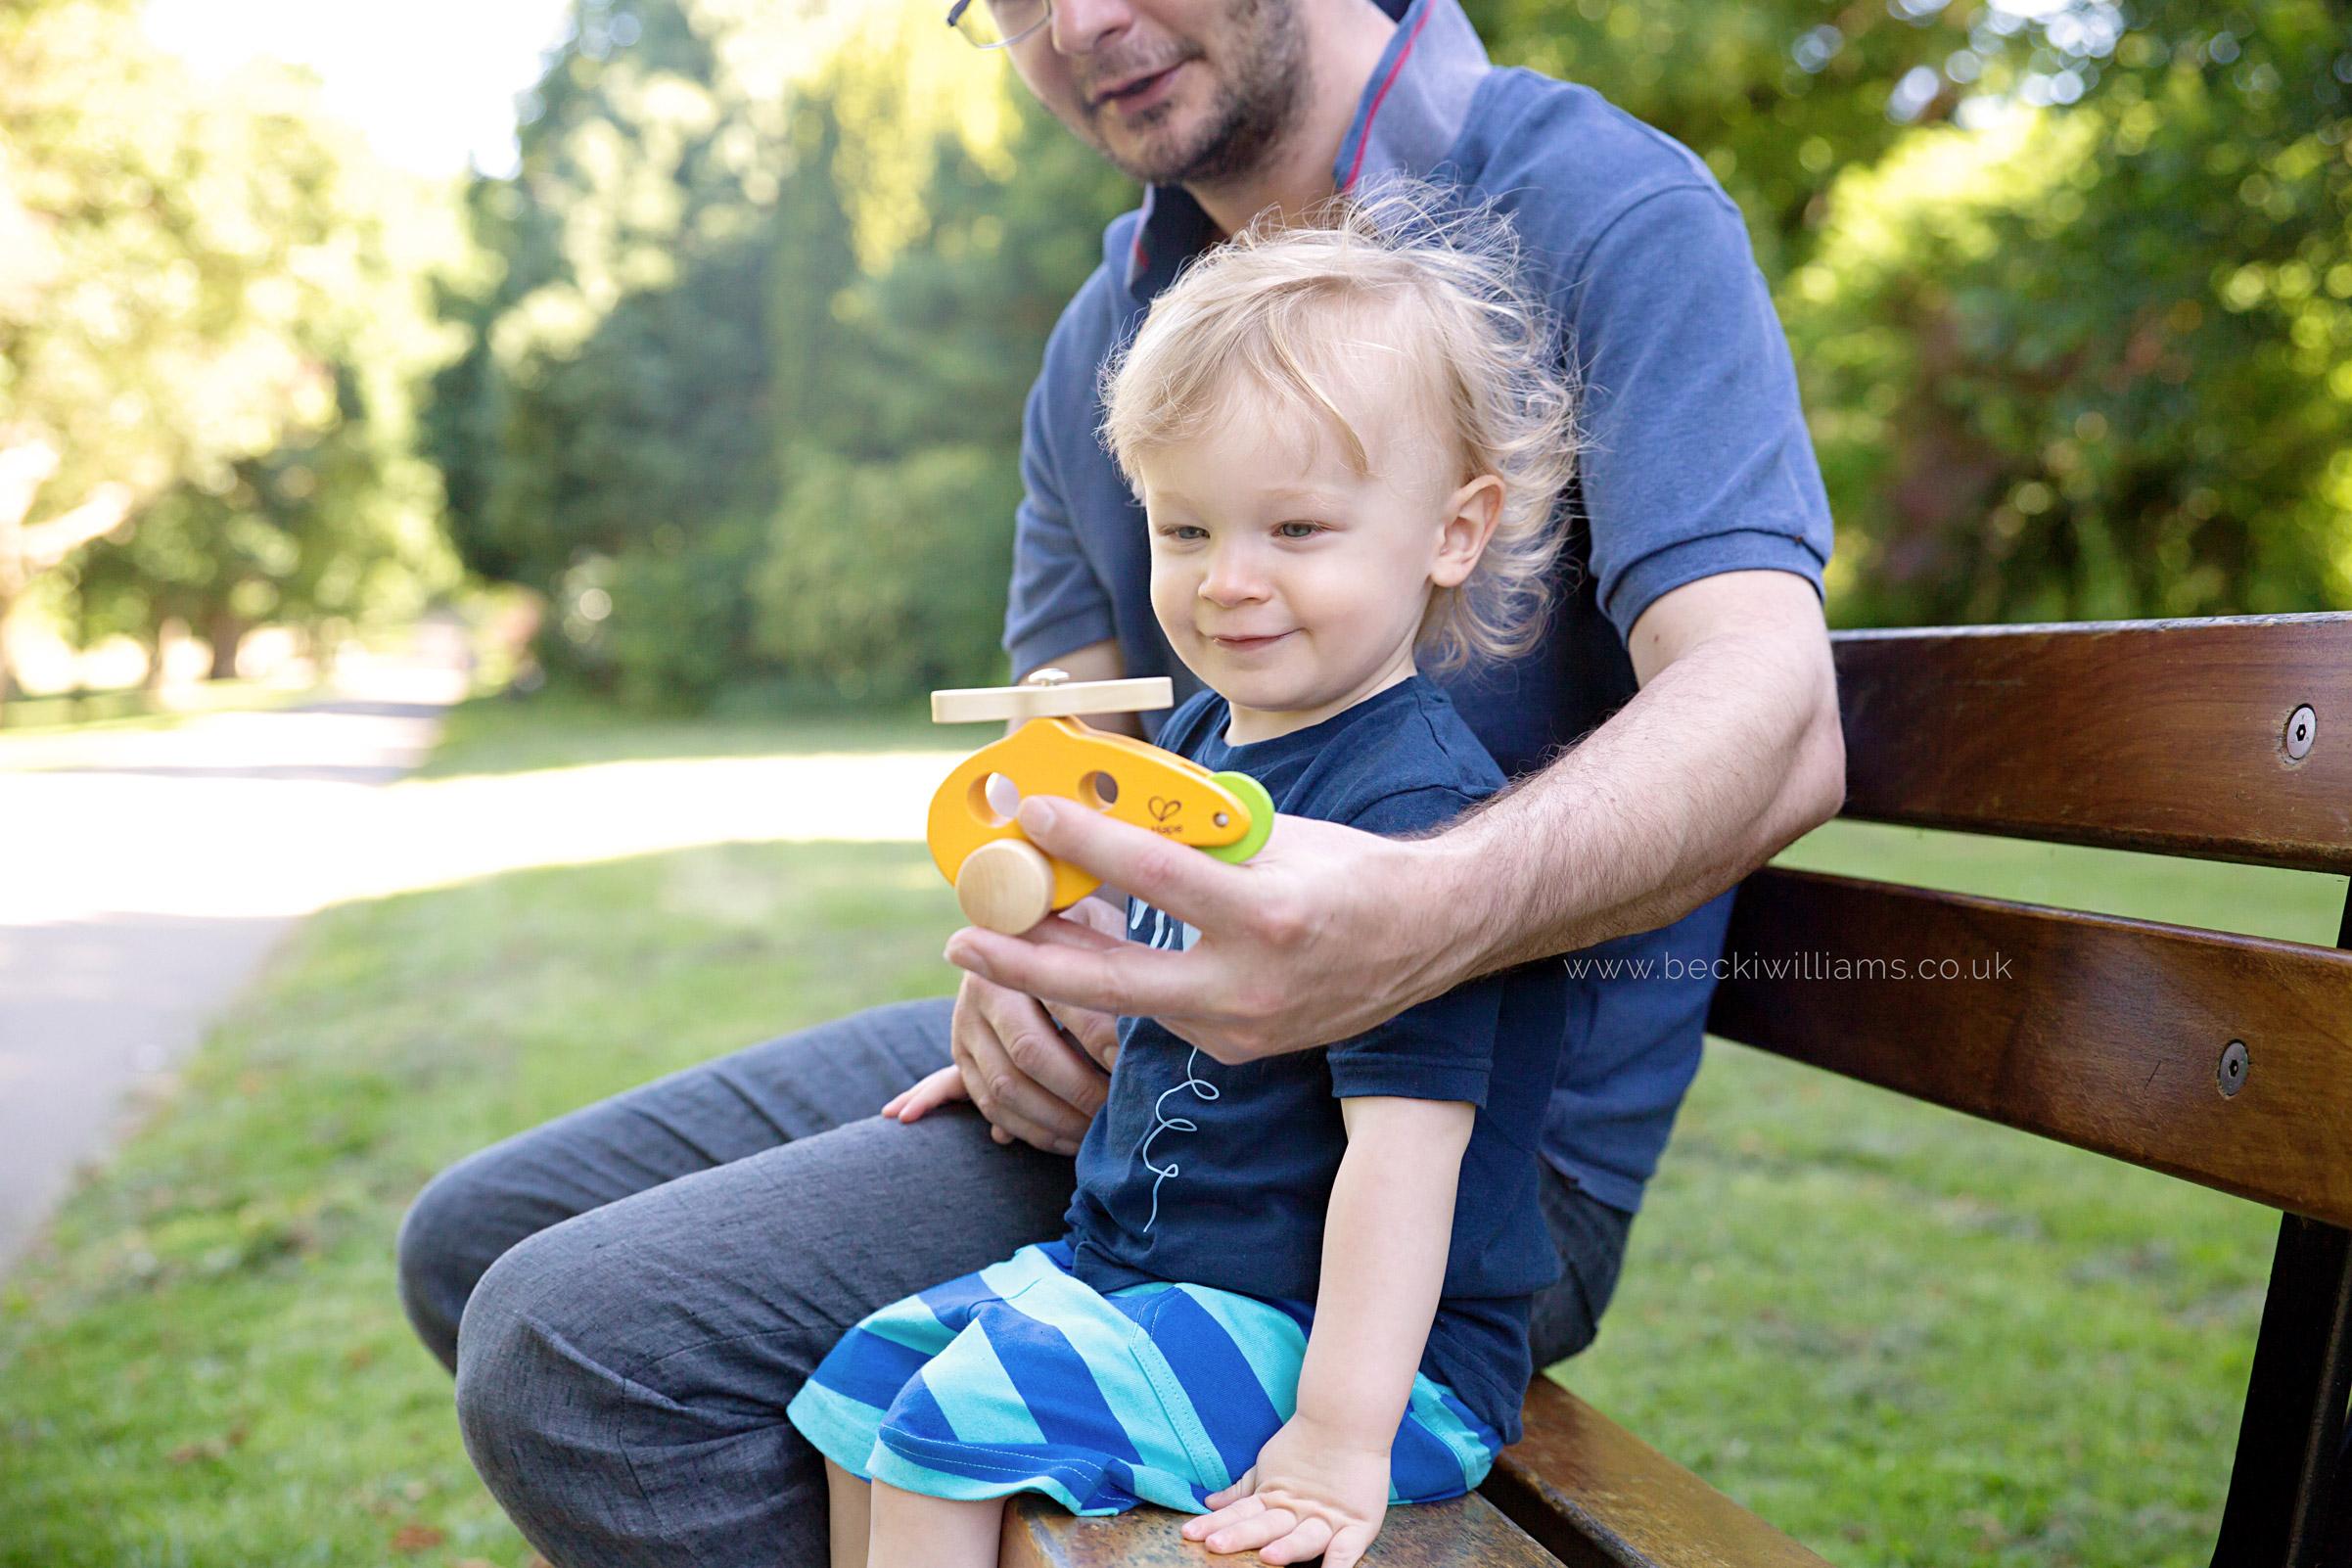 professional photography of 2 year old boy with his dad in gadebridge park, hemel hempstead